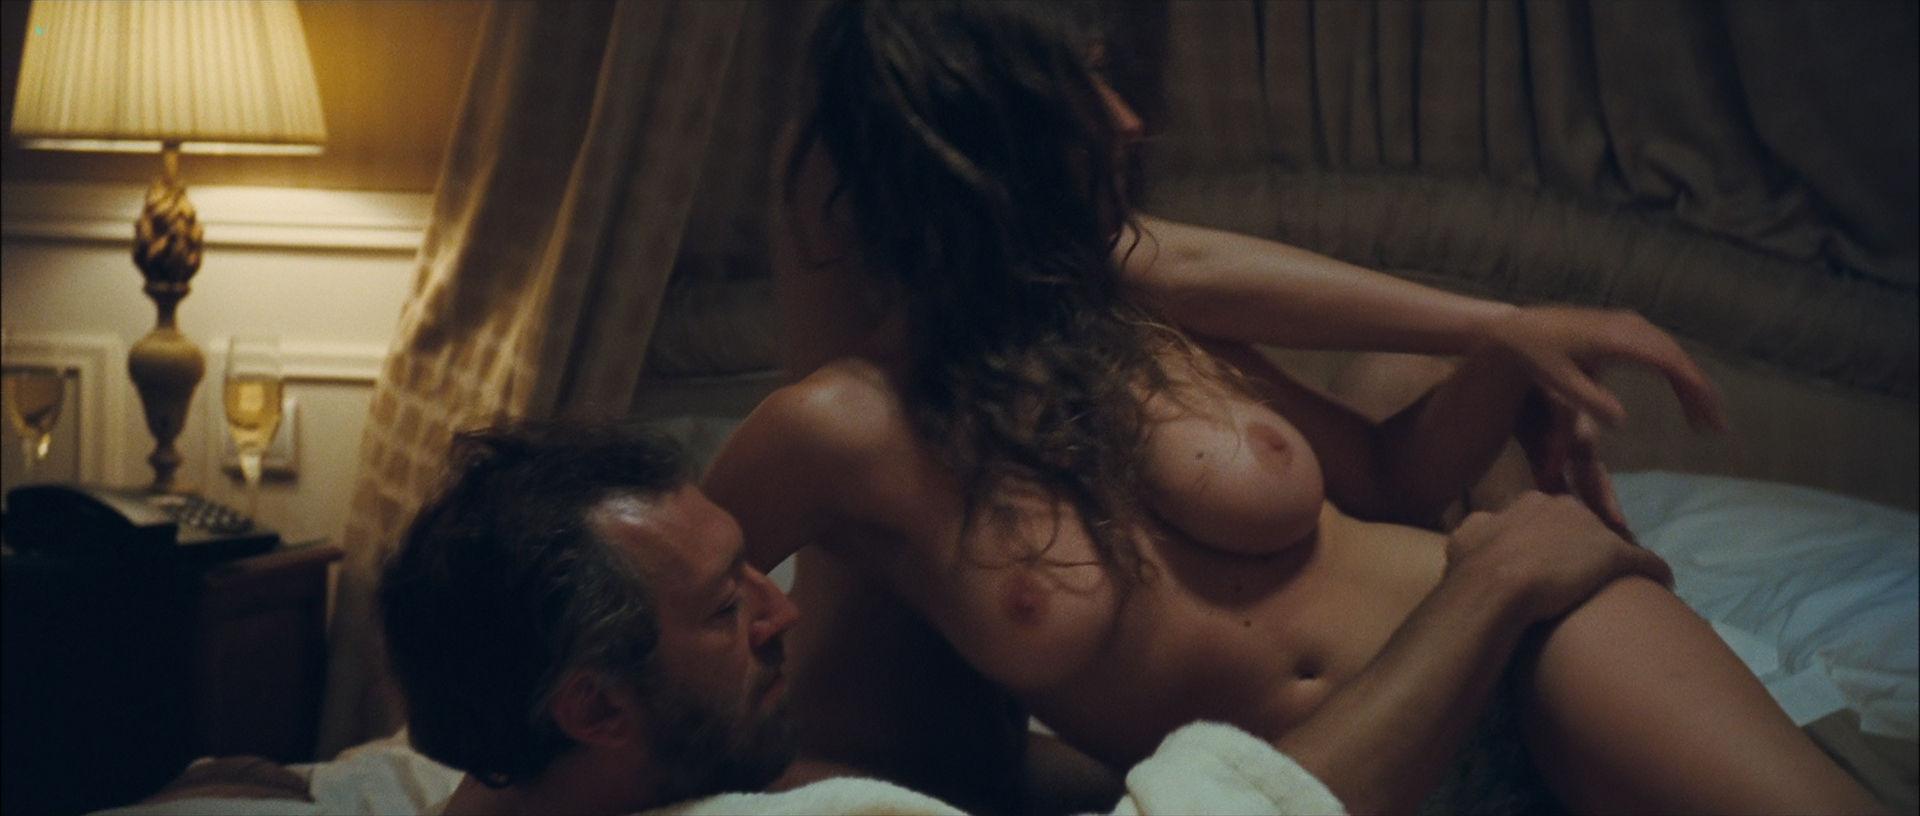 Camille Rowe nude and Josephine de La Baume nude sex threesome - Notre jour viendra (FR-2010) HD 1080p BluRay (12)